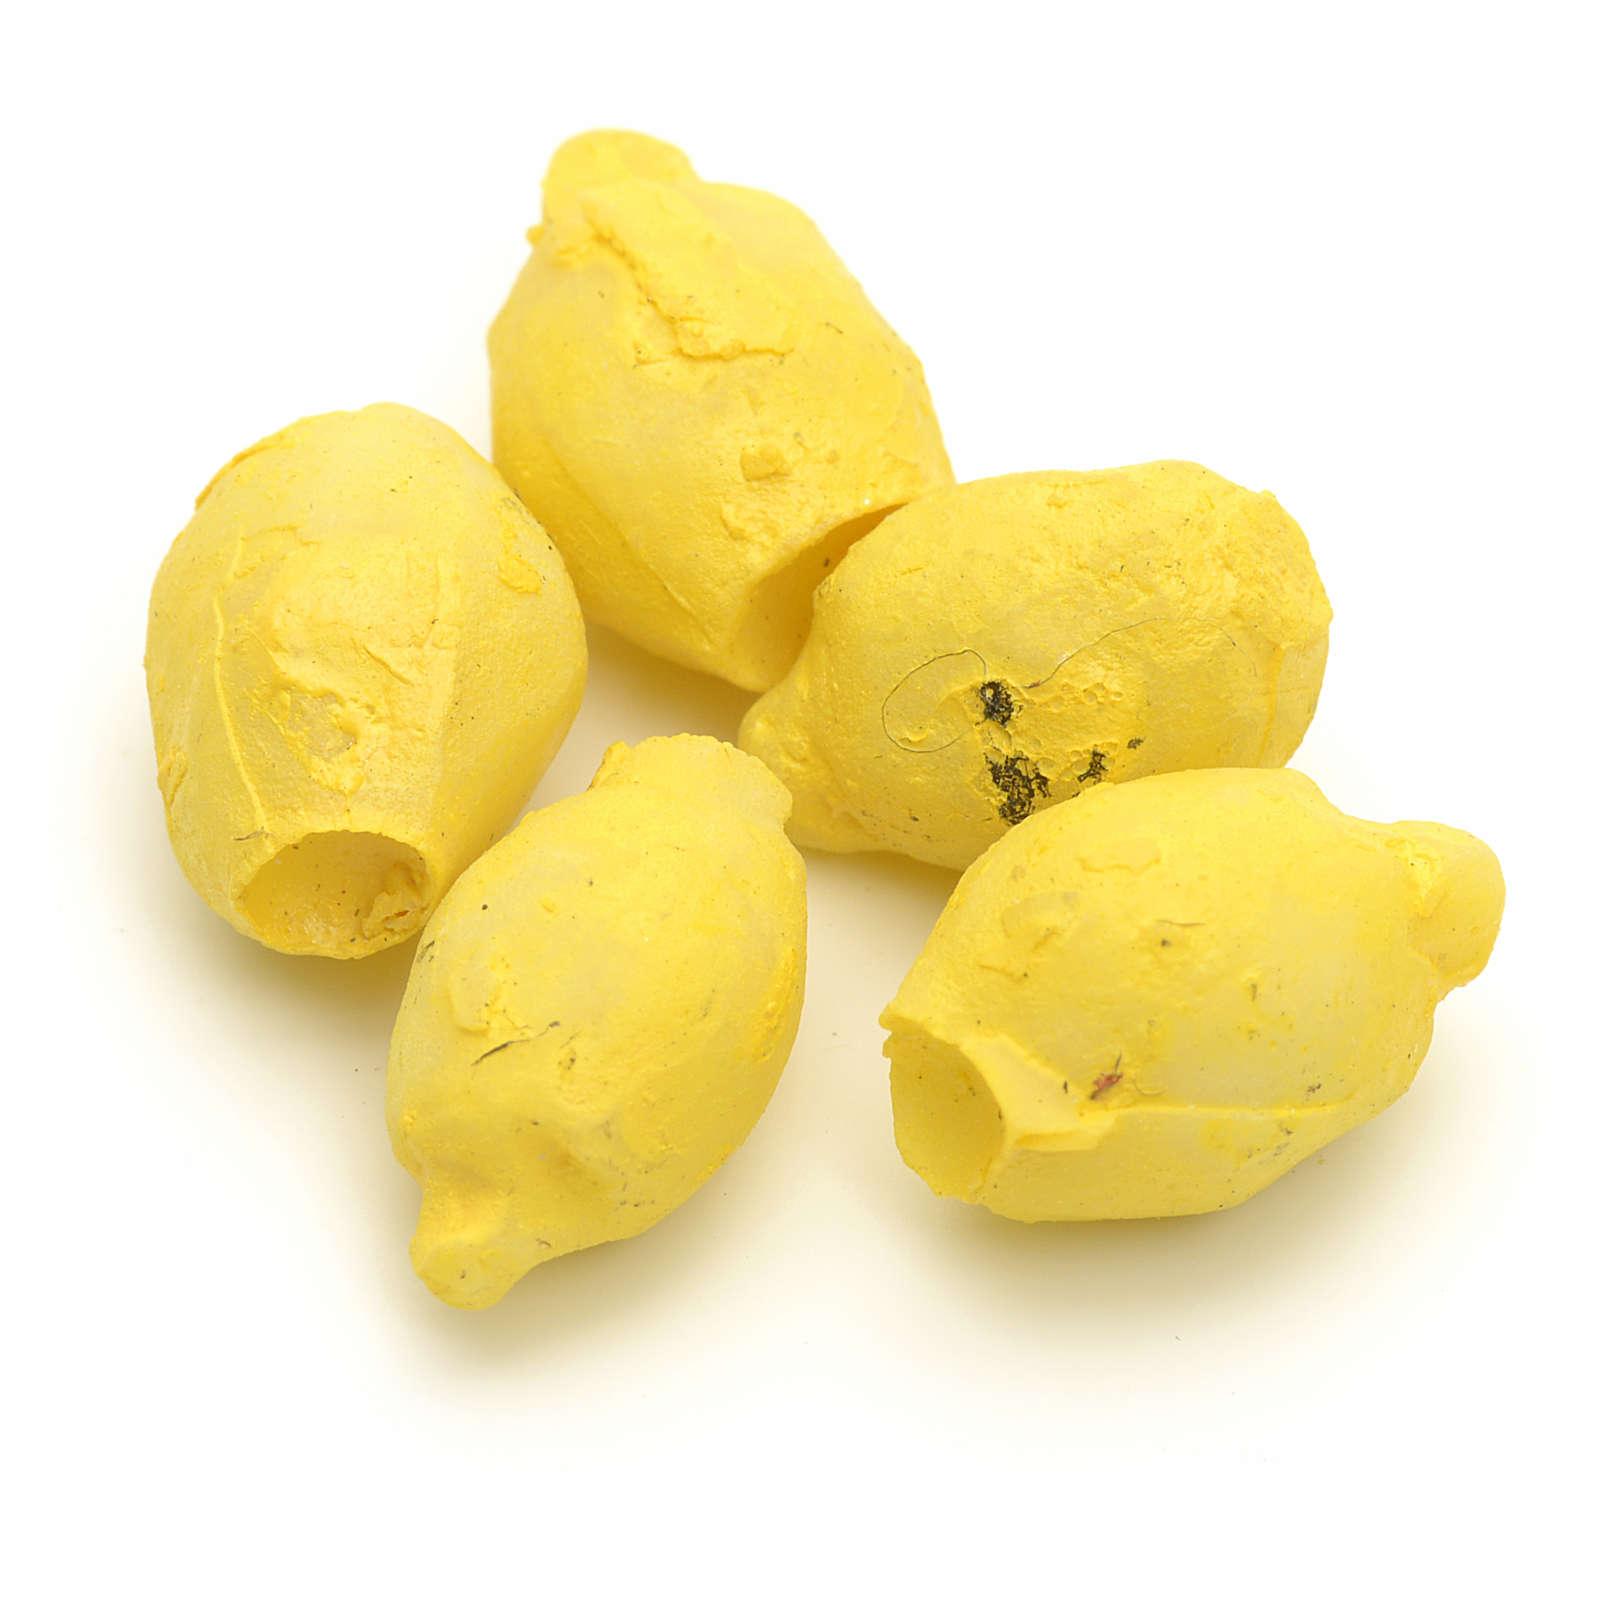 Limoni presepe fai da te 5 pz 4